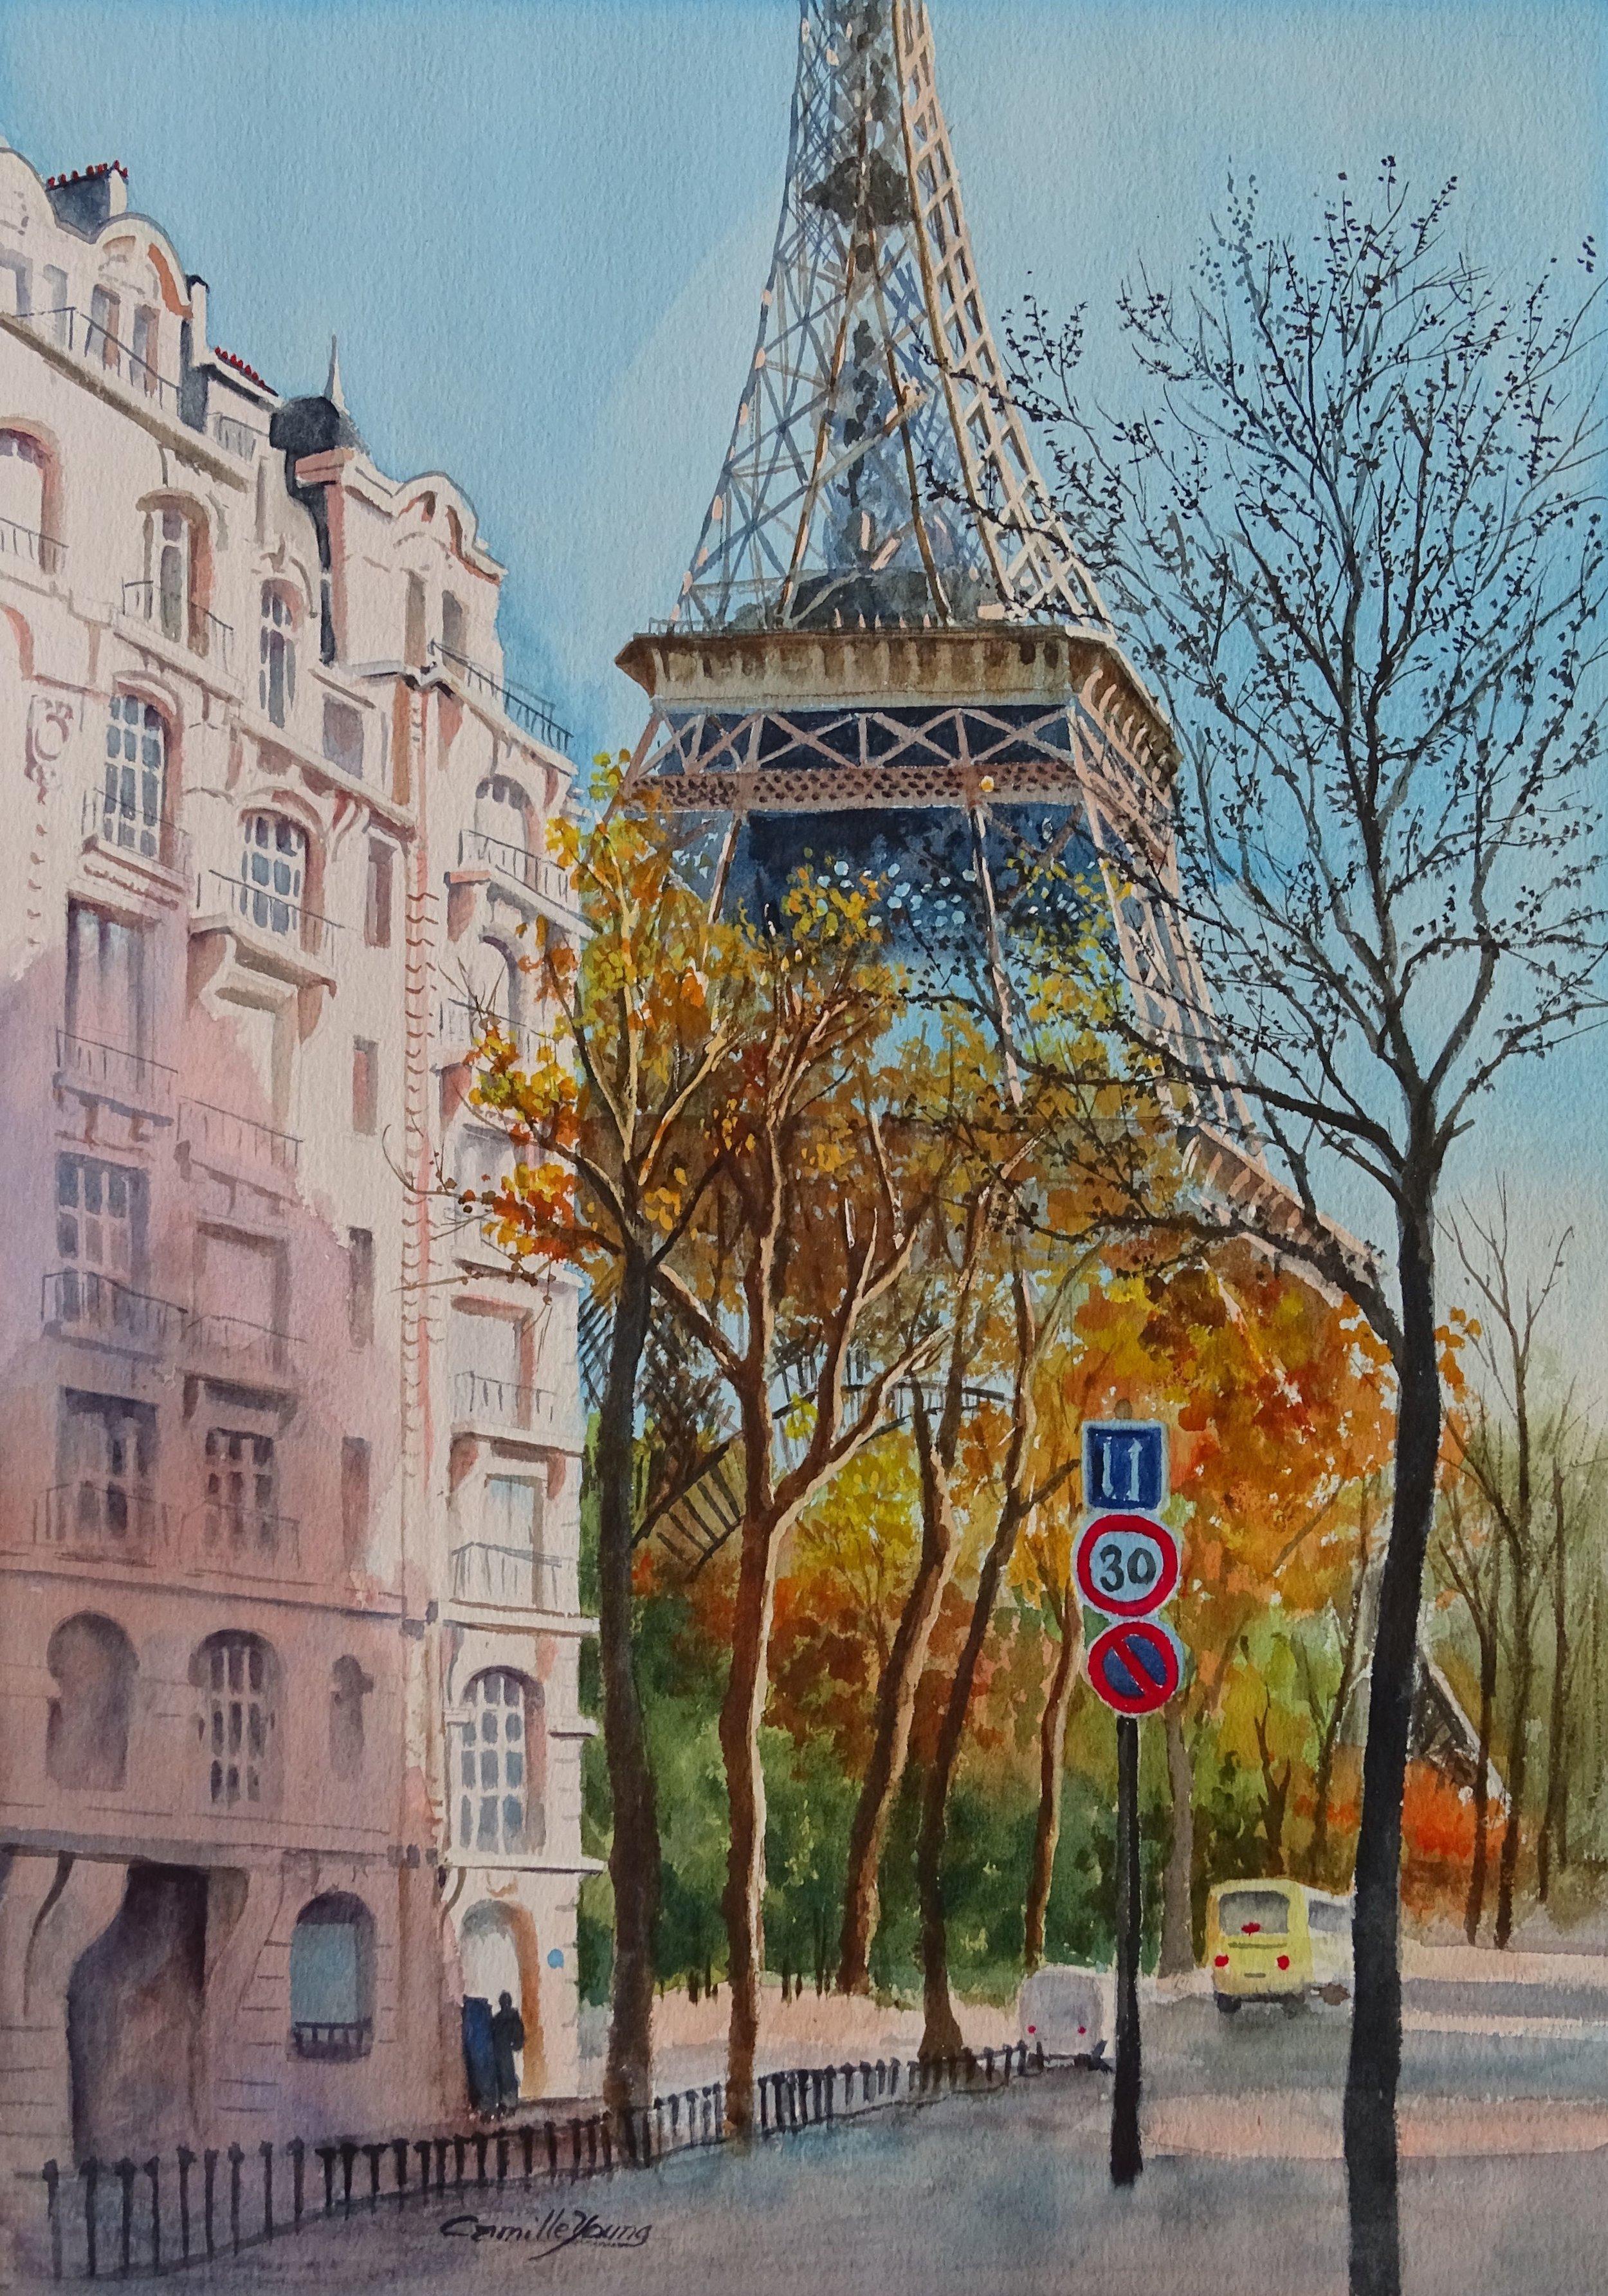 April in Paris   More Info →